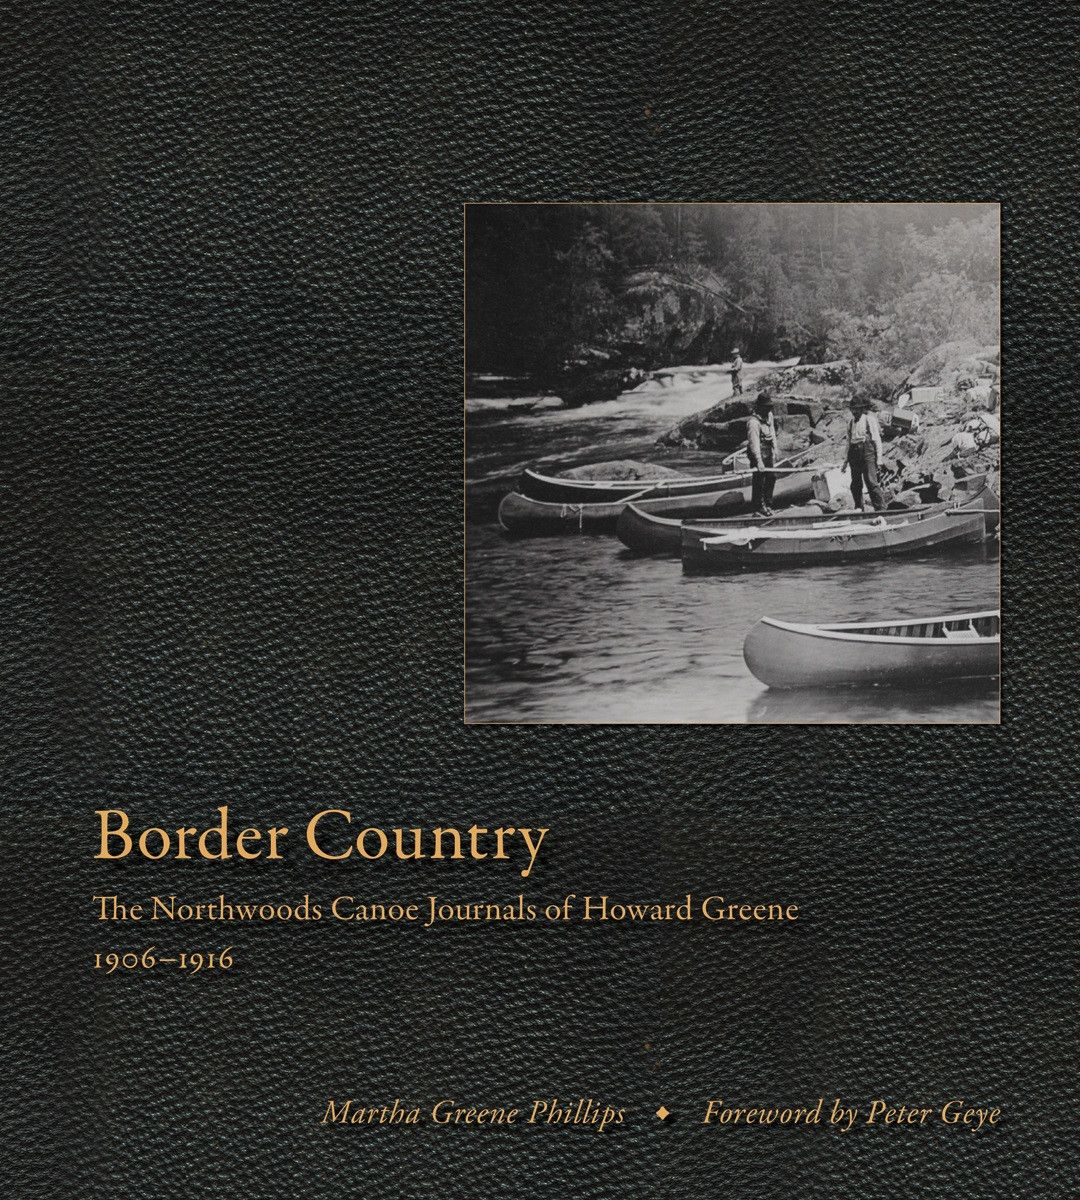 Northwoods Canoe Journals book cover